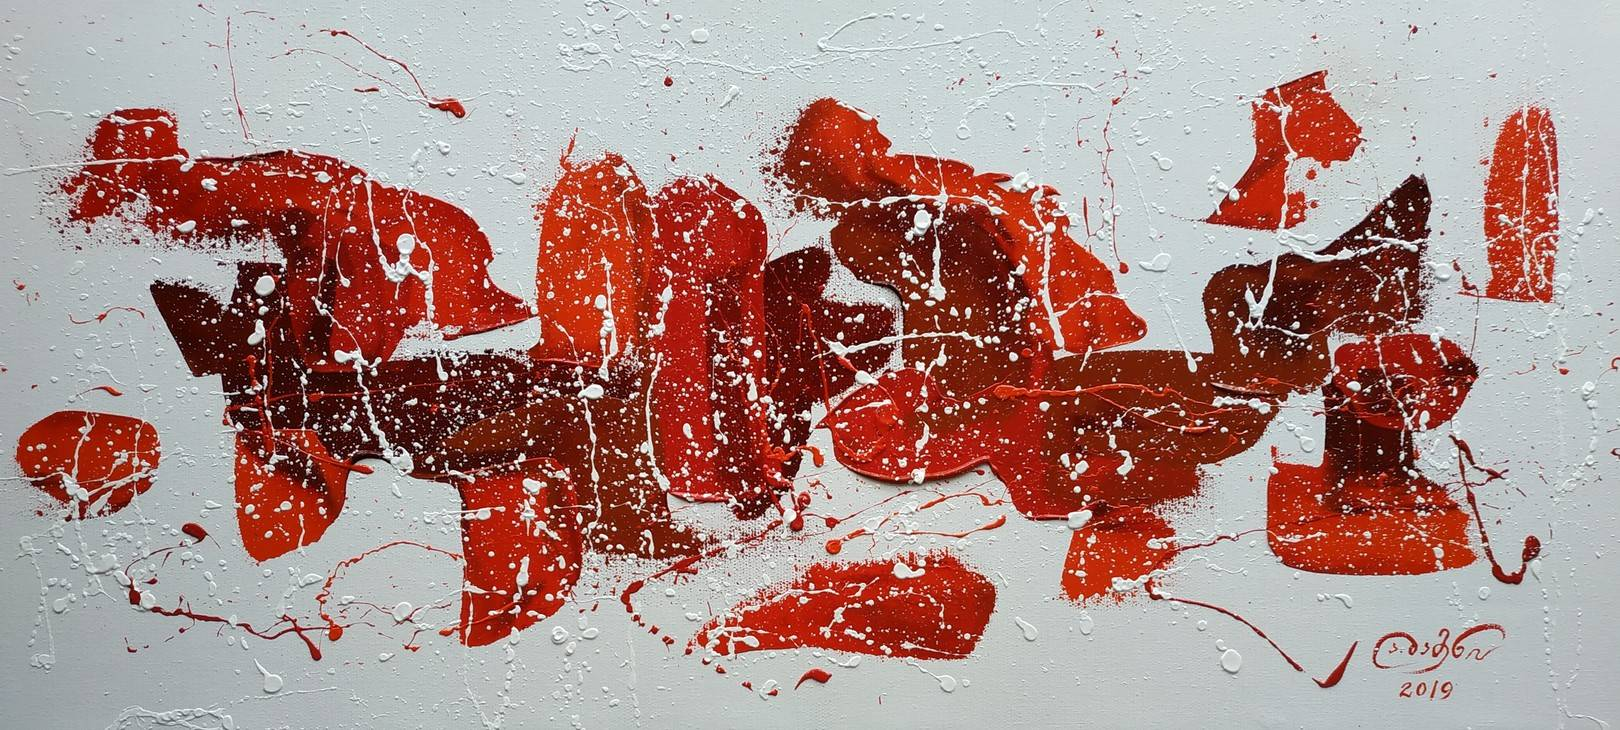 «Красная композиция»  холст, масло «Red composition»  oil on canvas  33x73,  2019